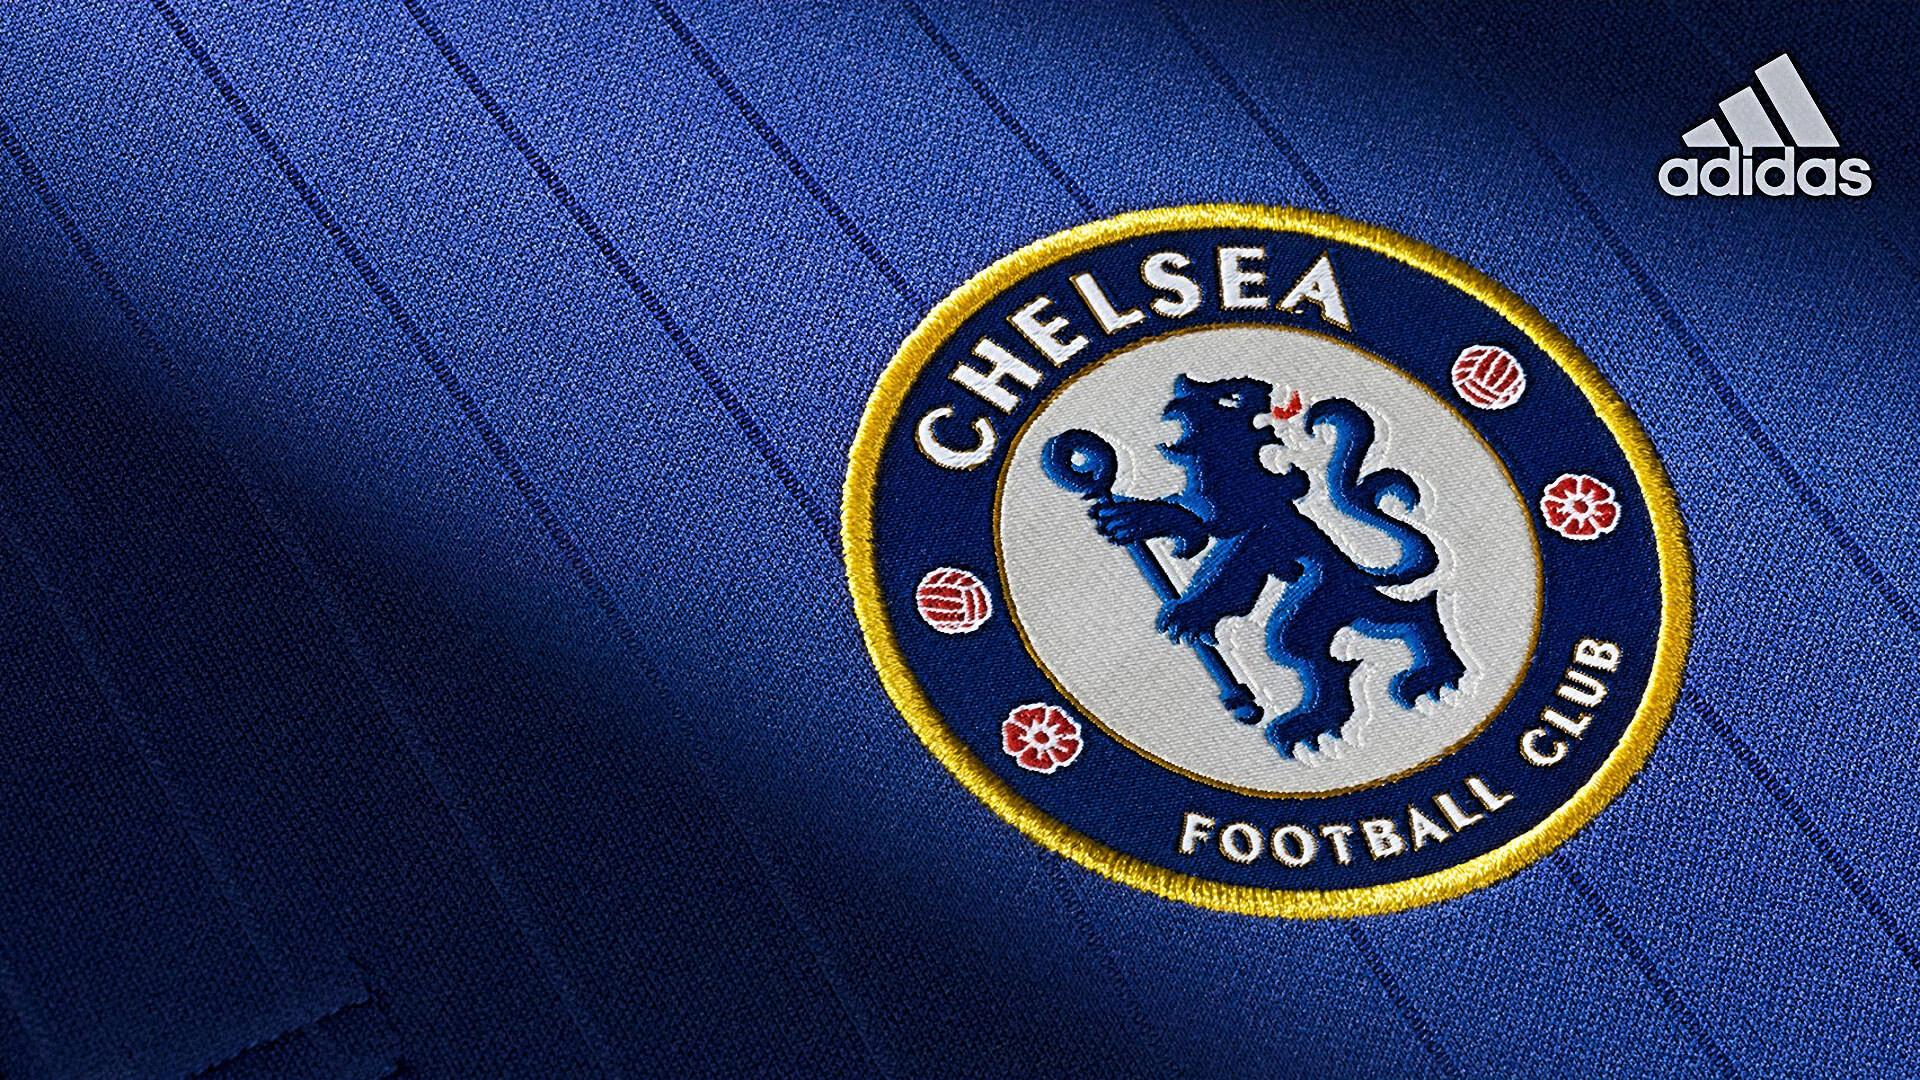 Chelsea Football Club 2015-2016 Adidas Jersey Badge HD Wallpaper